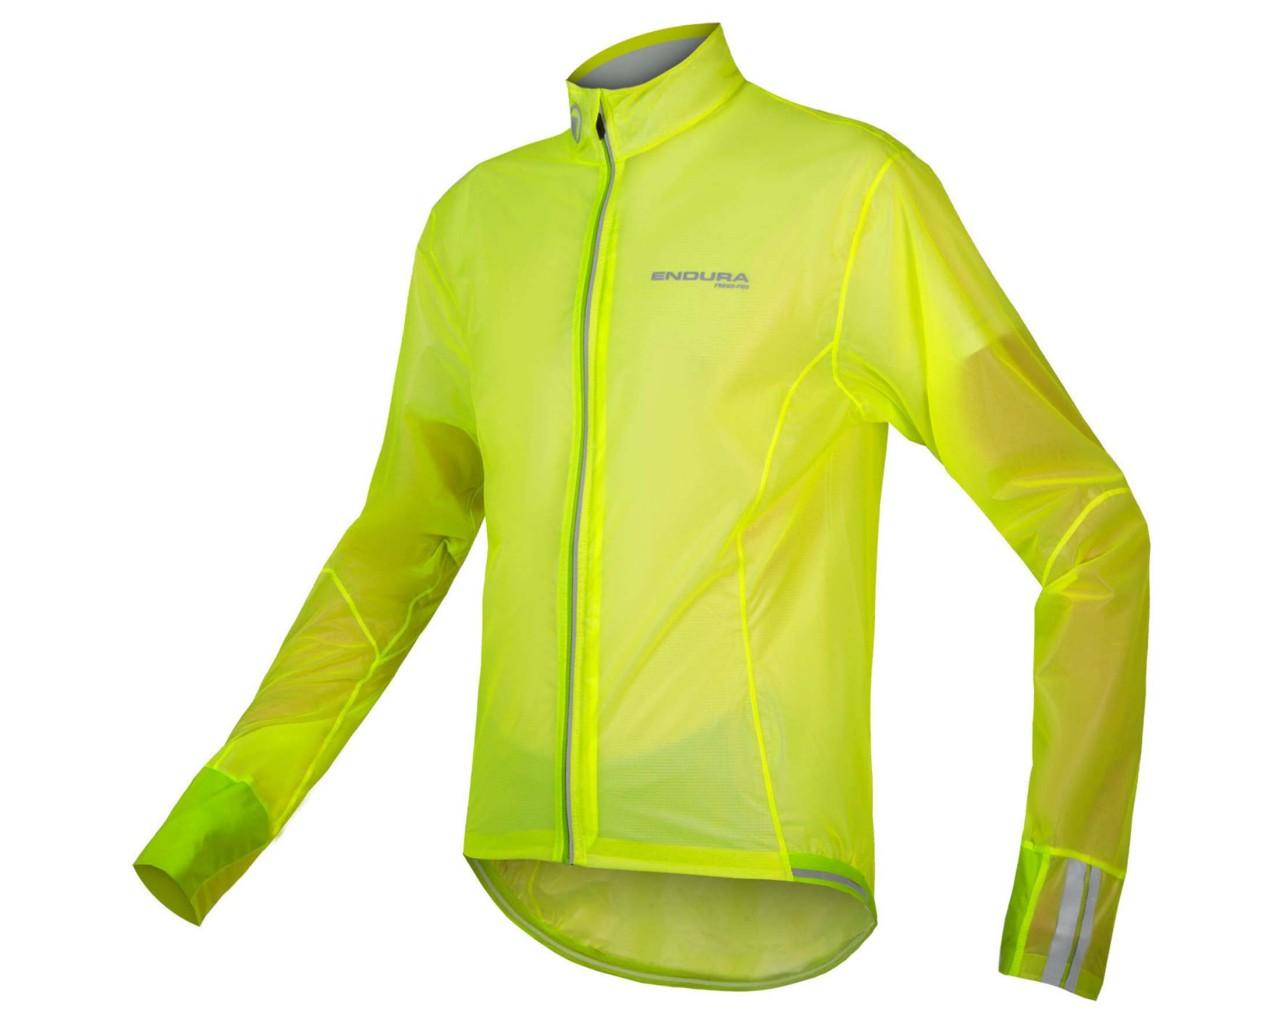 Endura FS260-Pro Adrenaline Race Cape II   neon yellow